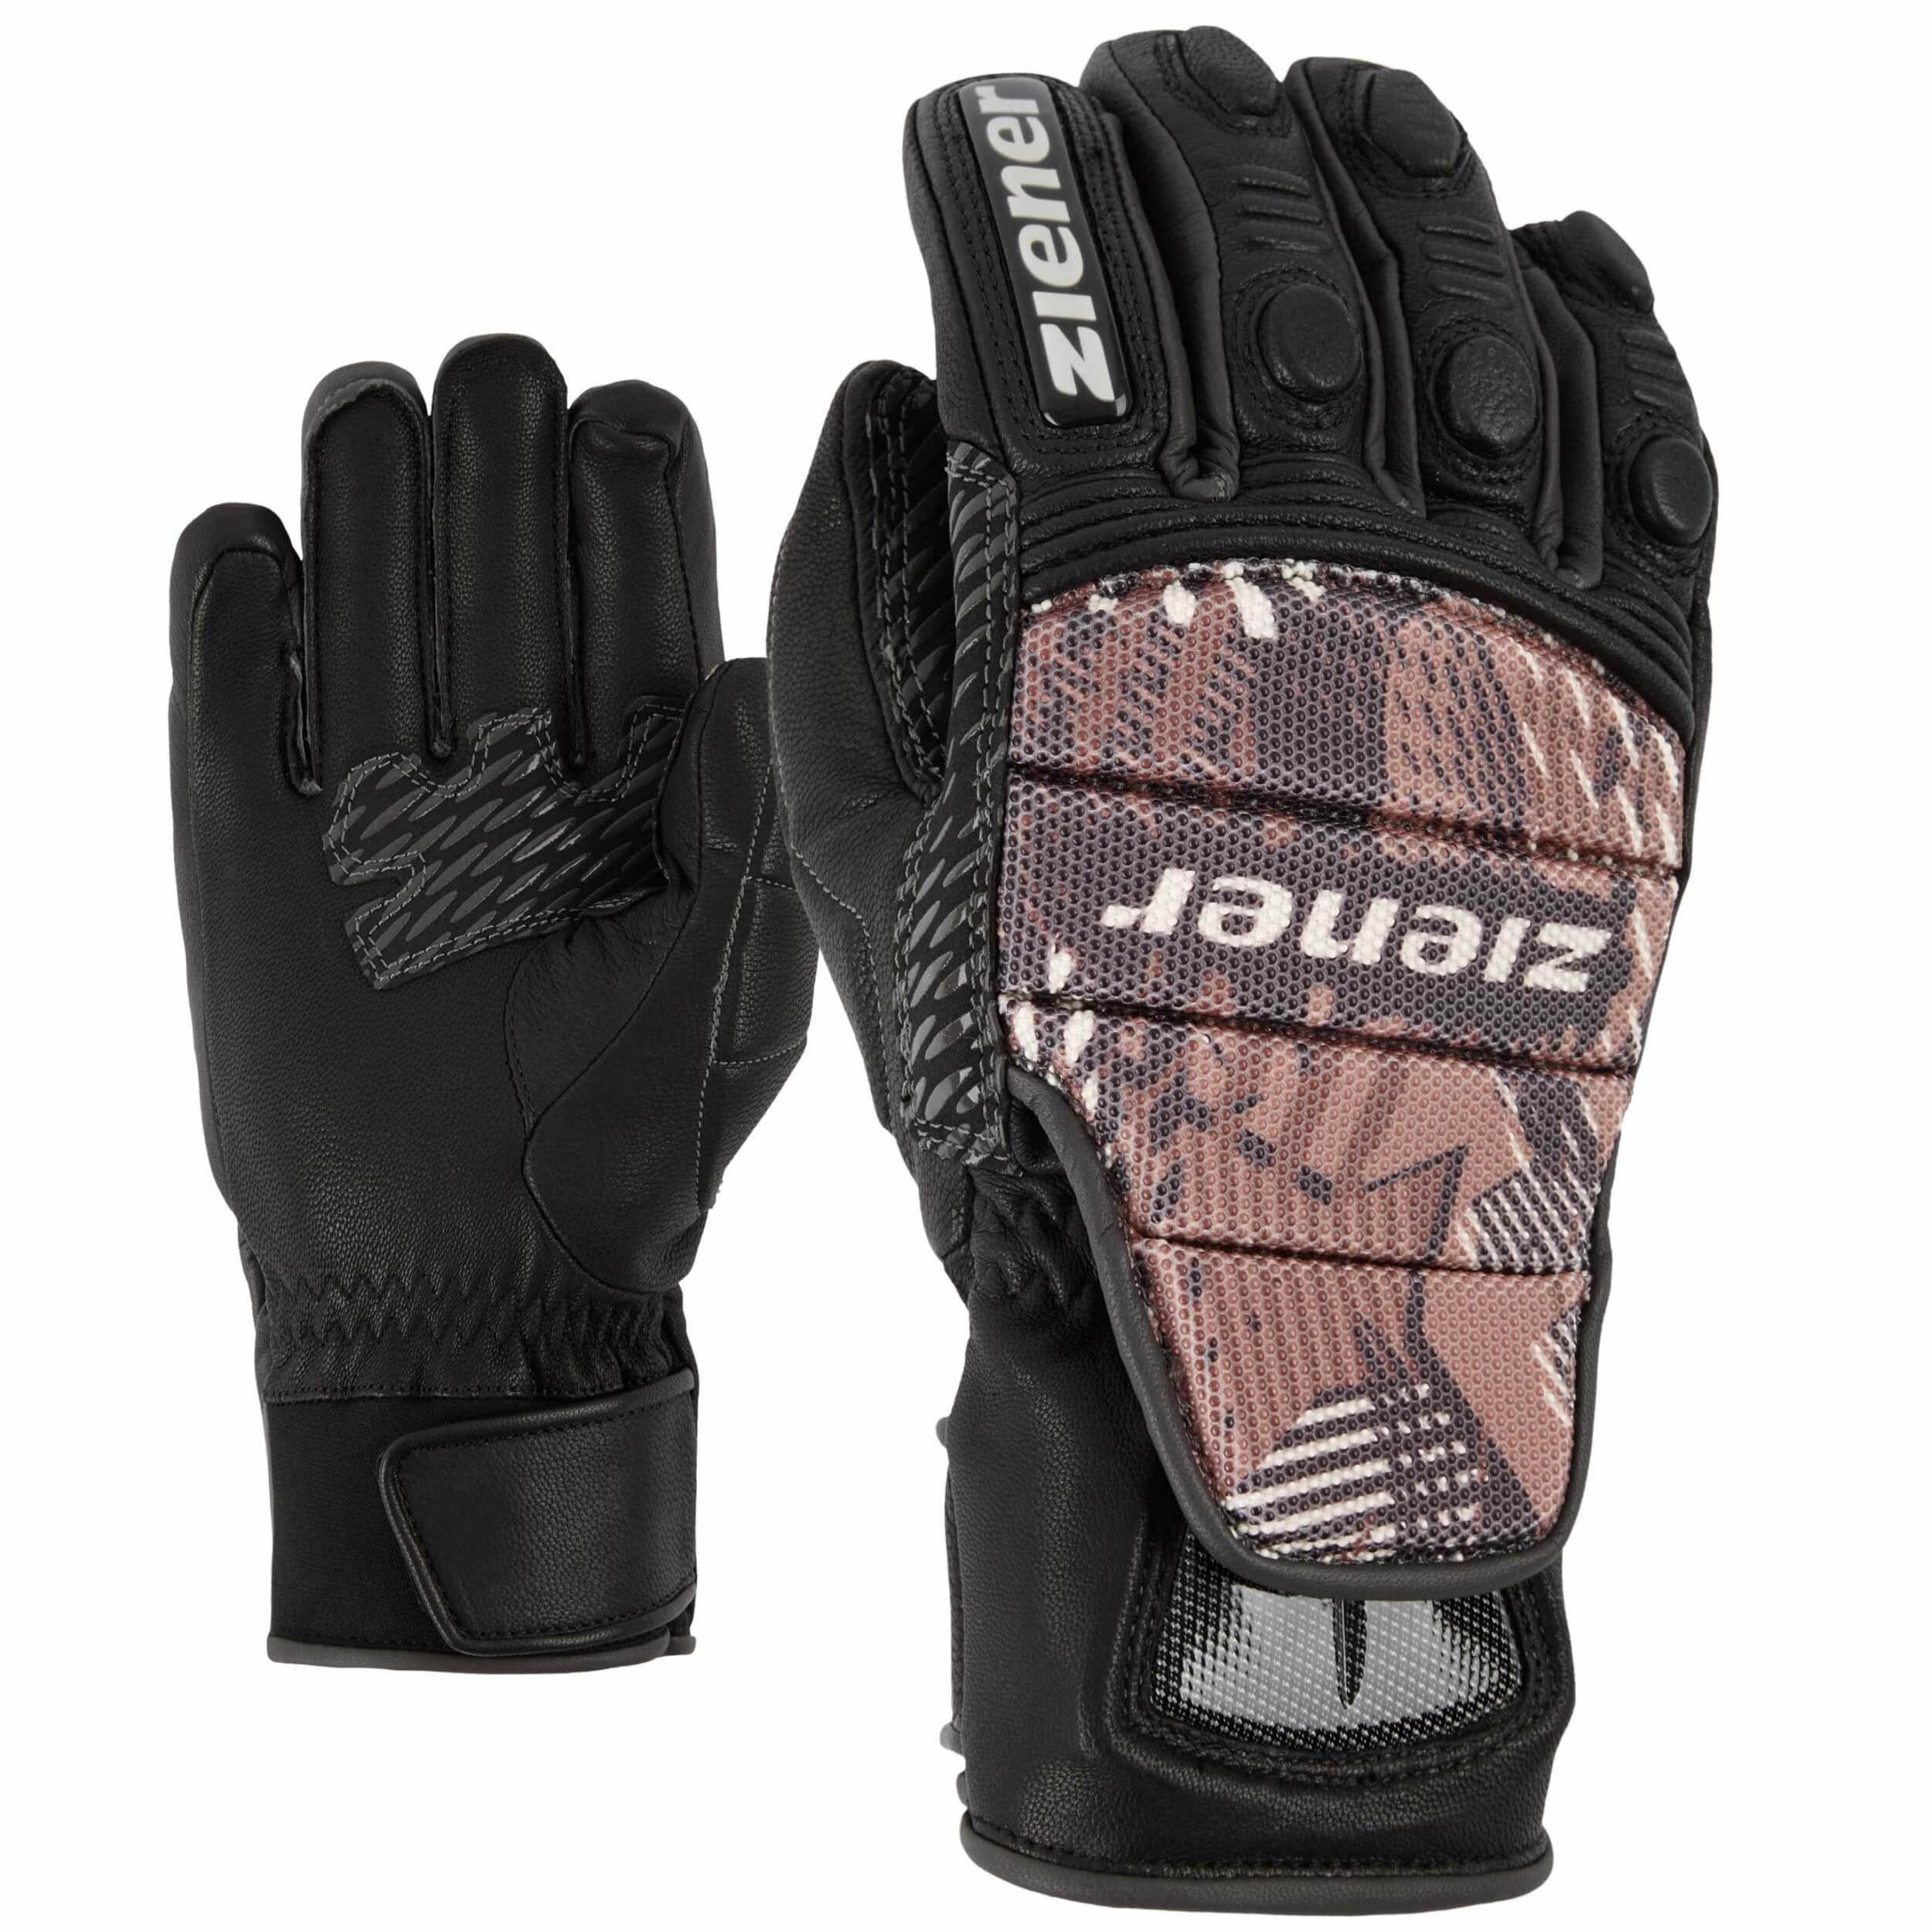 ZIENER Ski Race Handschuhe Grib 15 grau